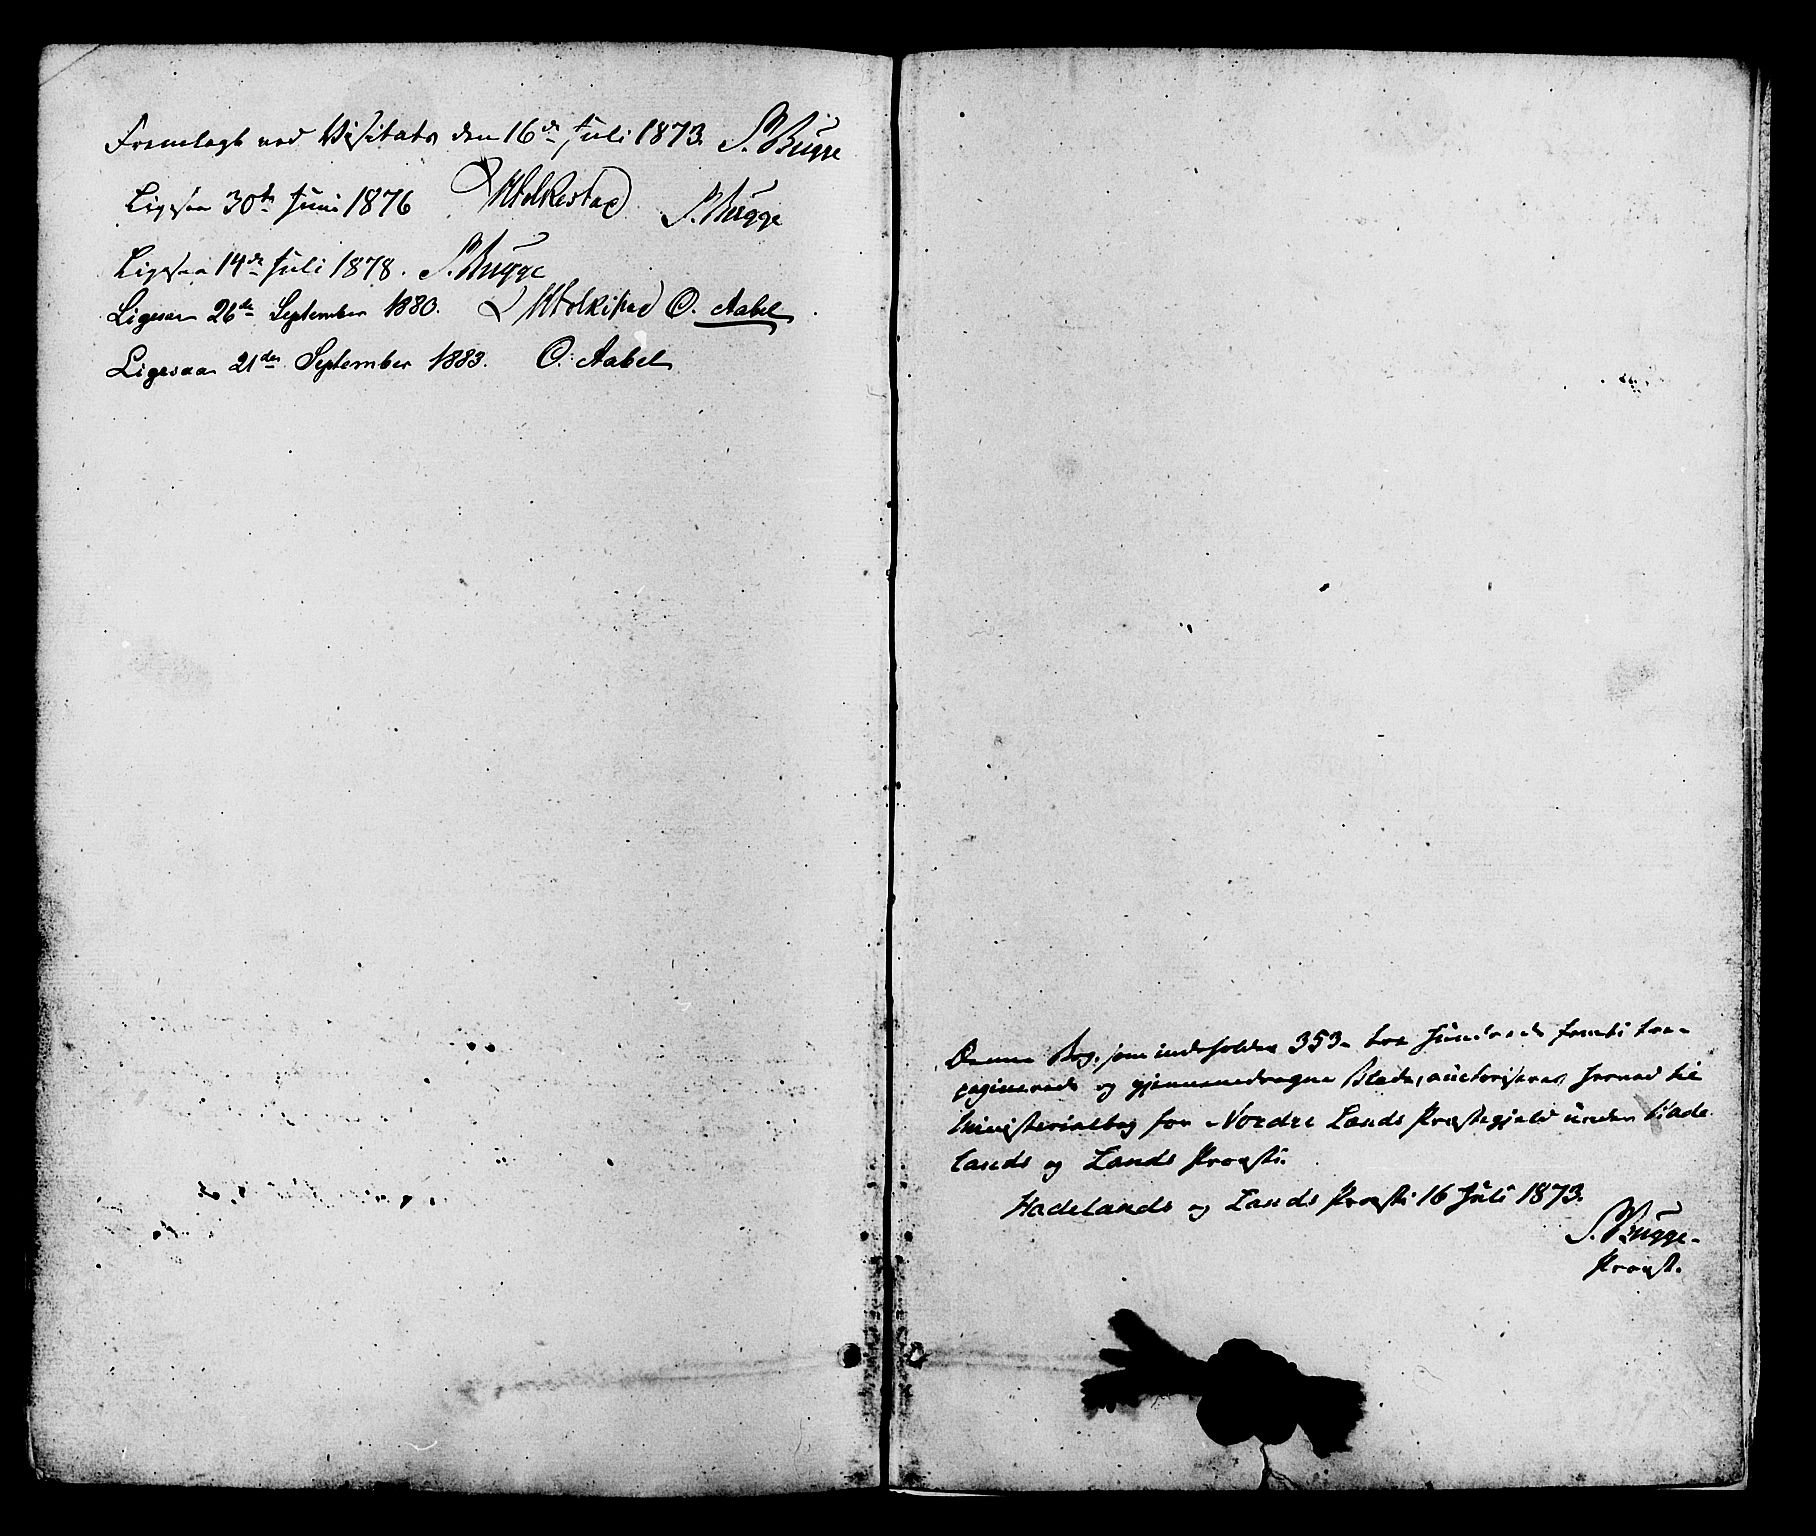 SAH, Nordre Land prestekontor, Ministerialbok nr. 2, 1872-1881